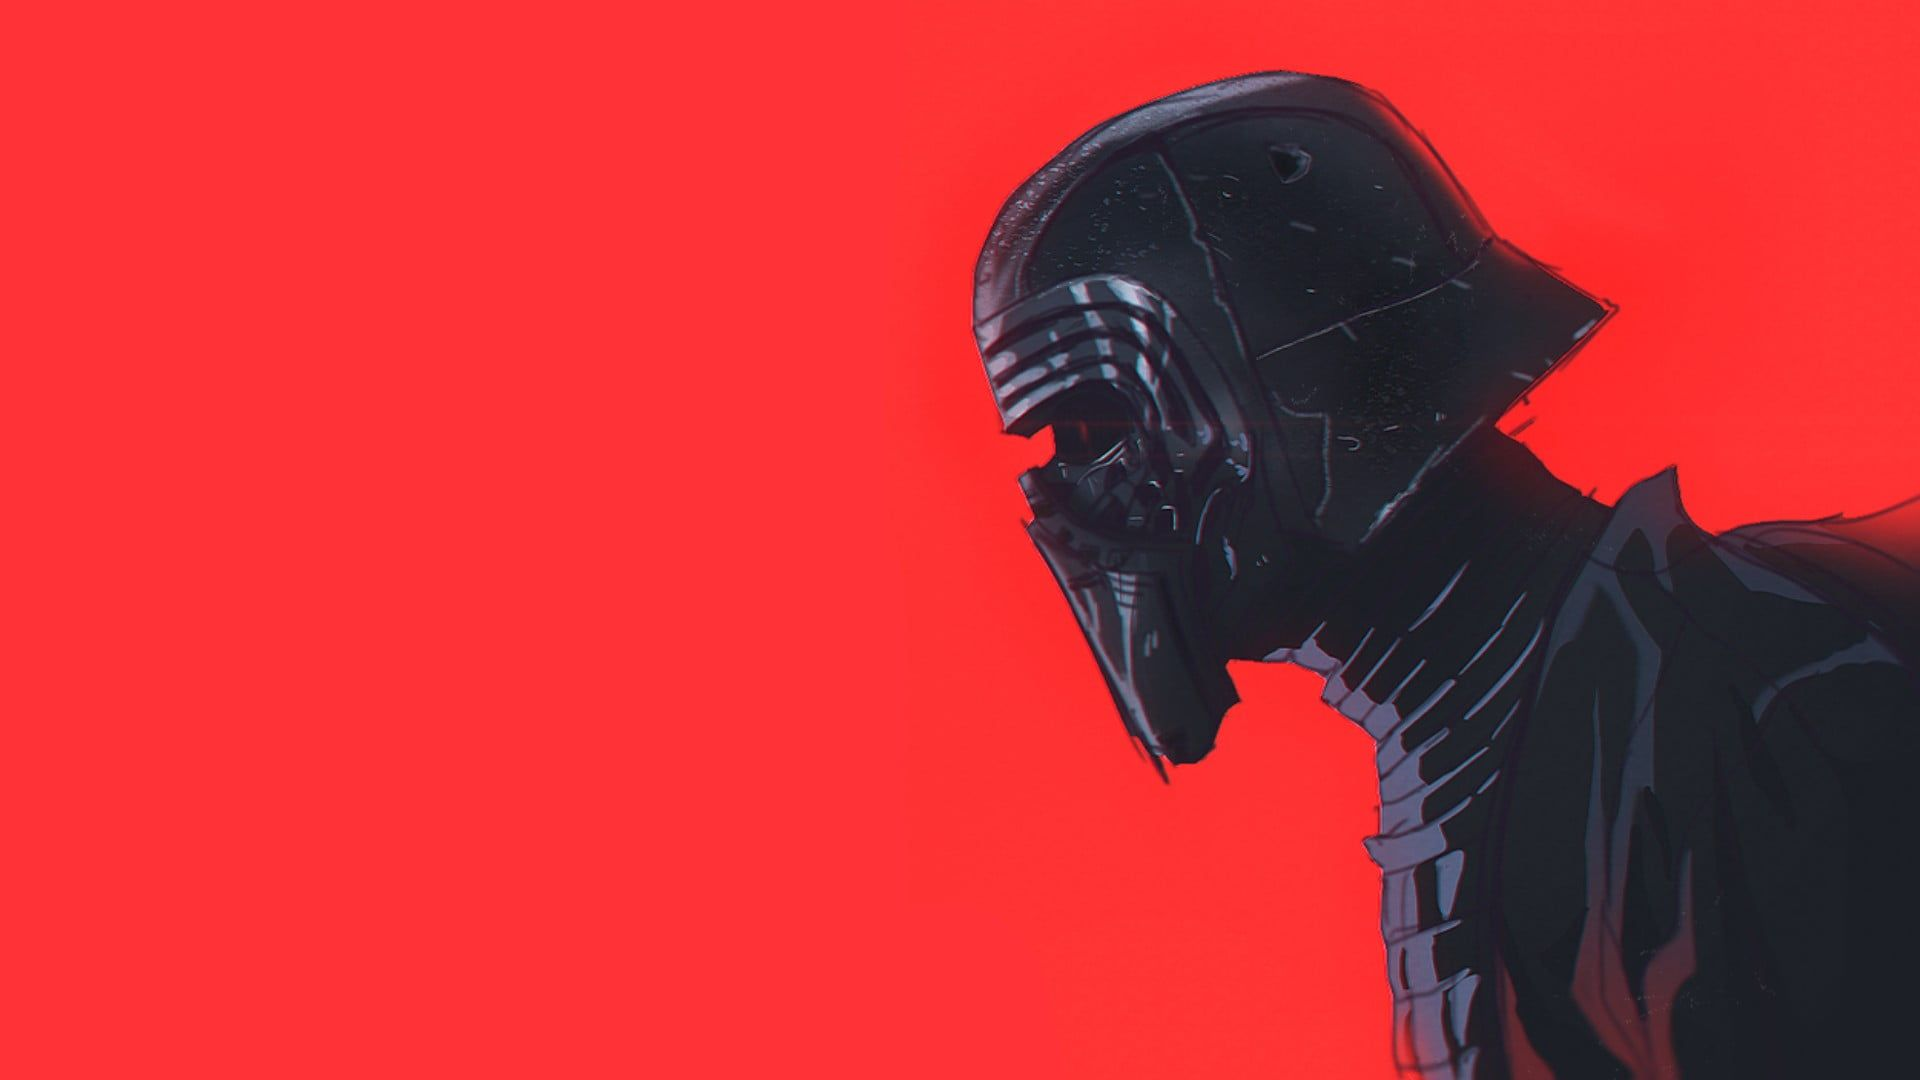 Dart Vader Illustration Kylo Ren Star Wars Mask Red 1080p Wallpaper Hdwallpaper Desktop Kylo Ren Wallpaper Star Wars Wallpaper Star Wars Background